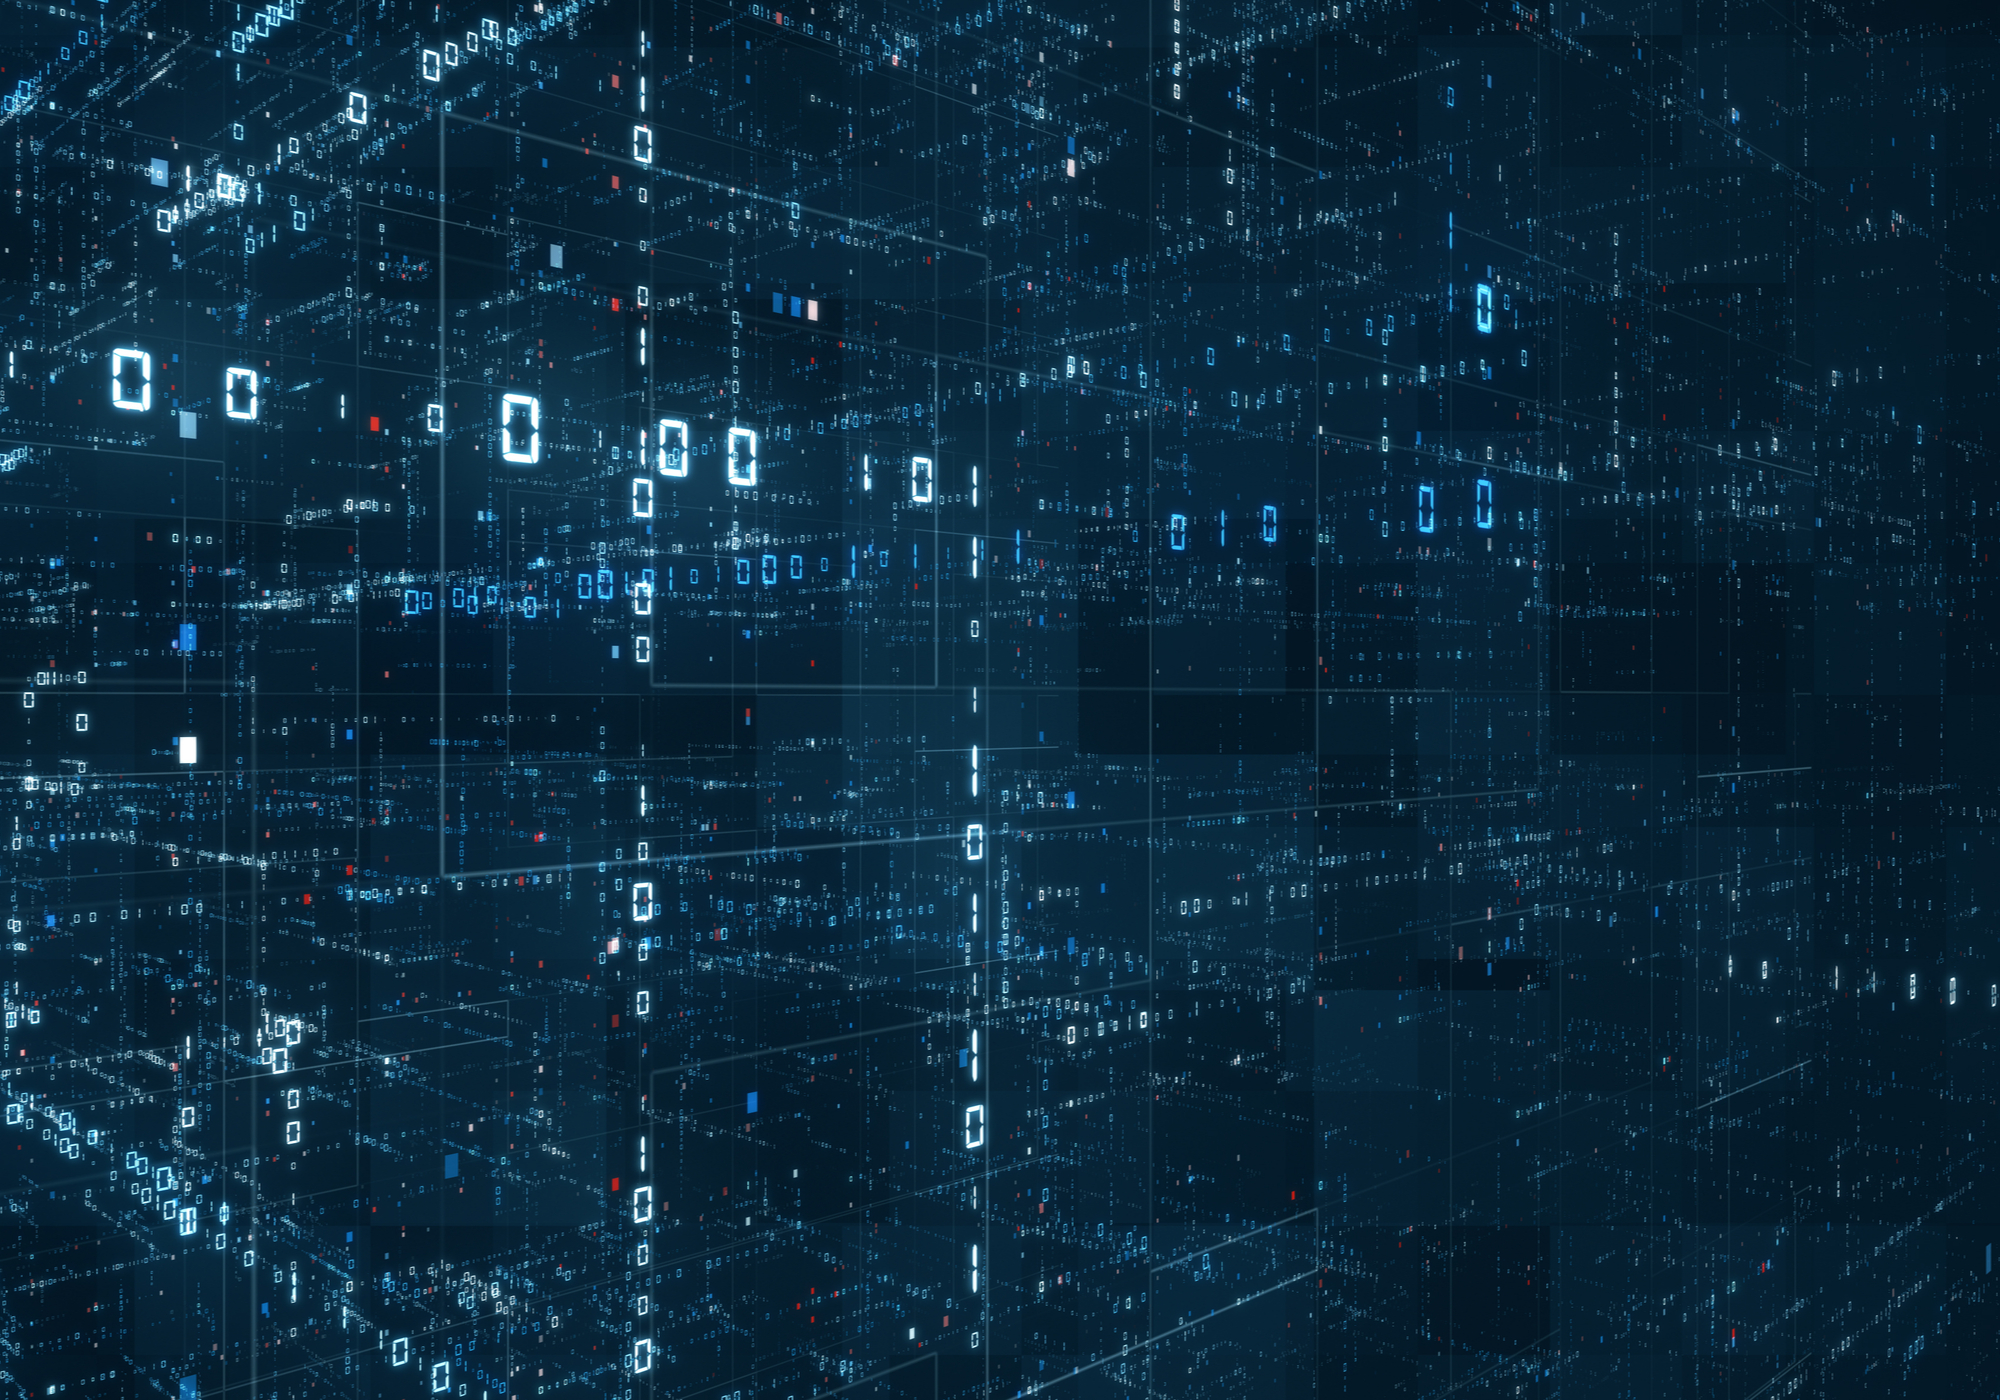 Five key advantages for enterprises leveraging intelligent analytics